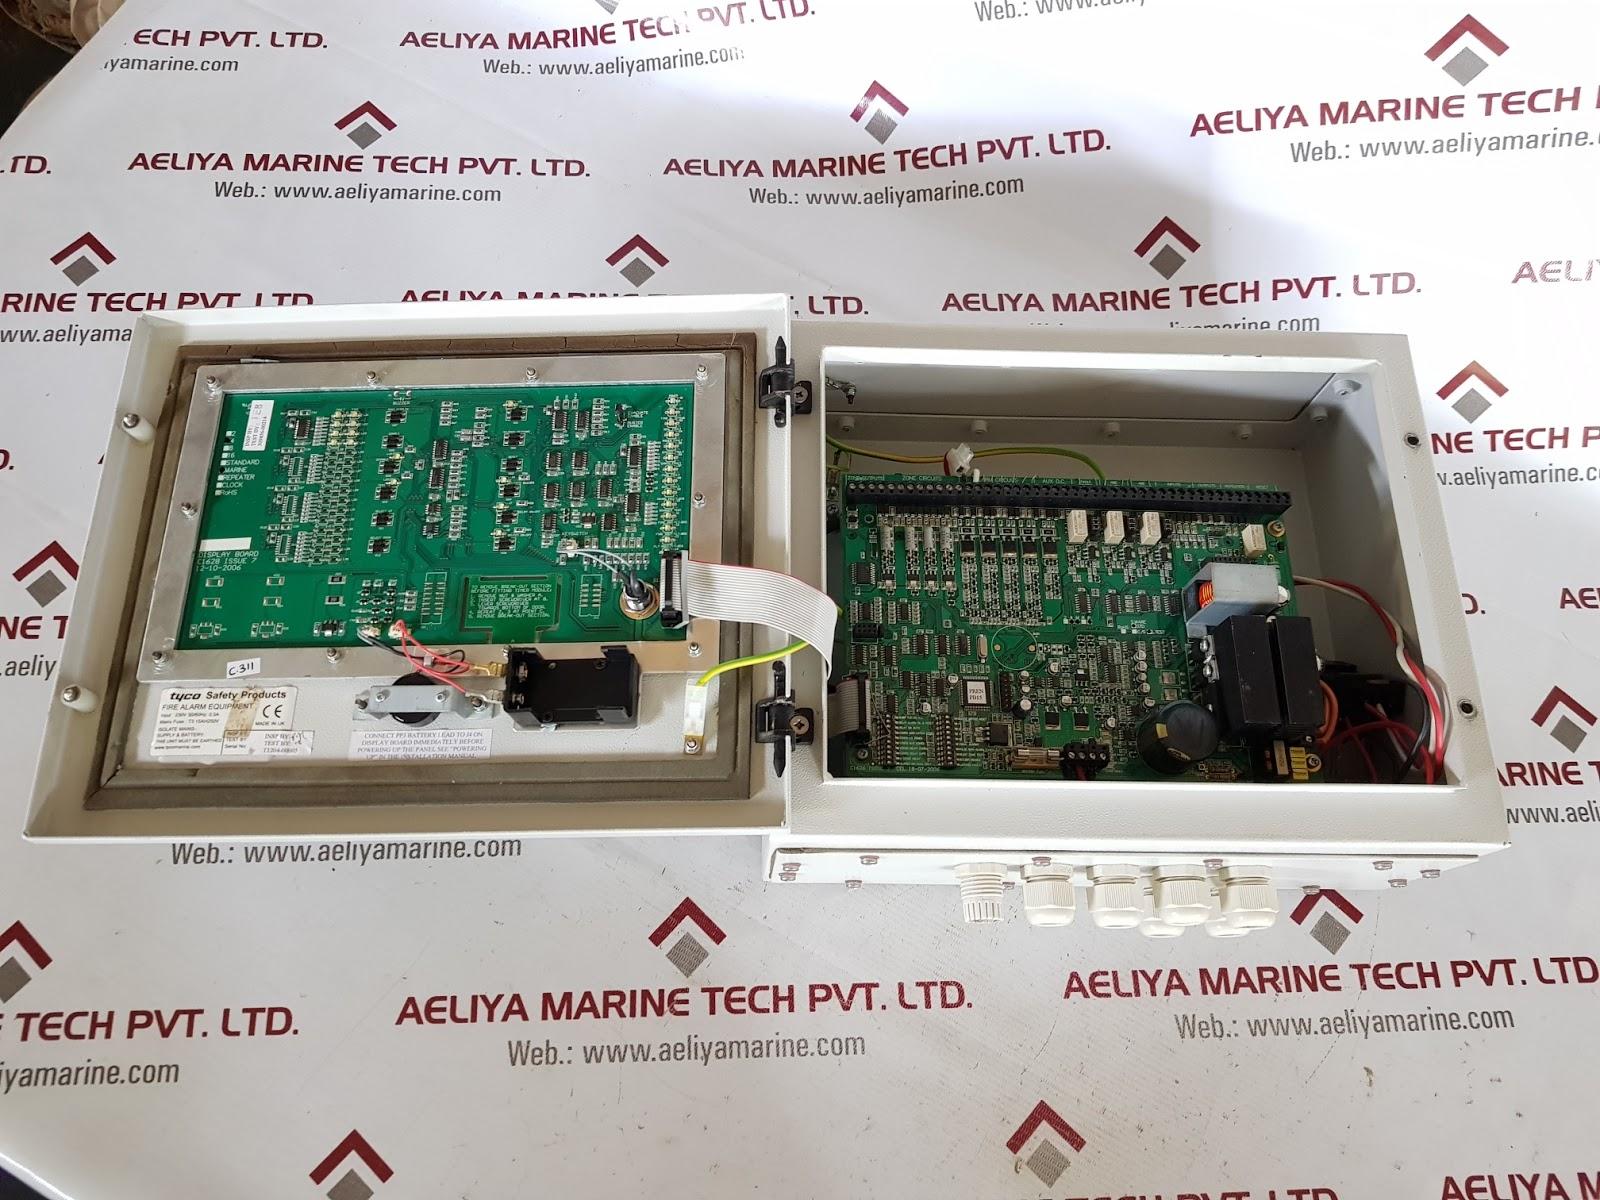 TYCO T1204A2 FIRE CONTROL PANELS | AELIYA MARINE TECH PVT LTD